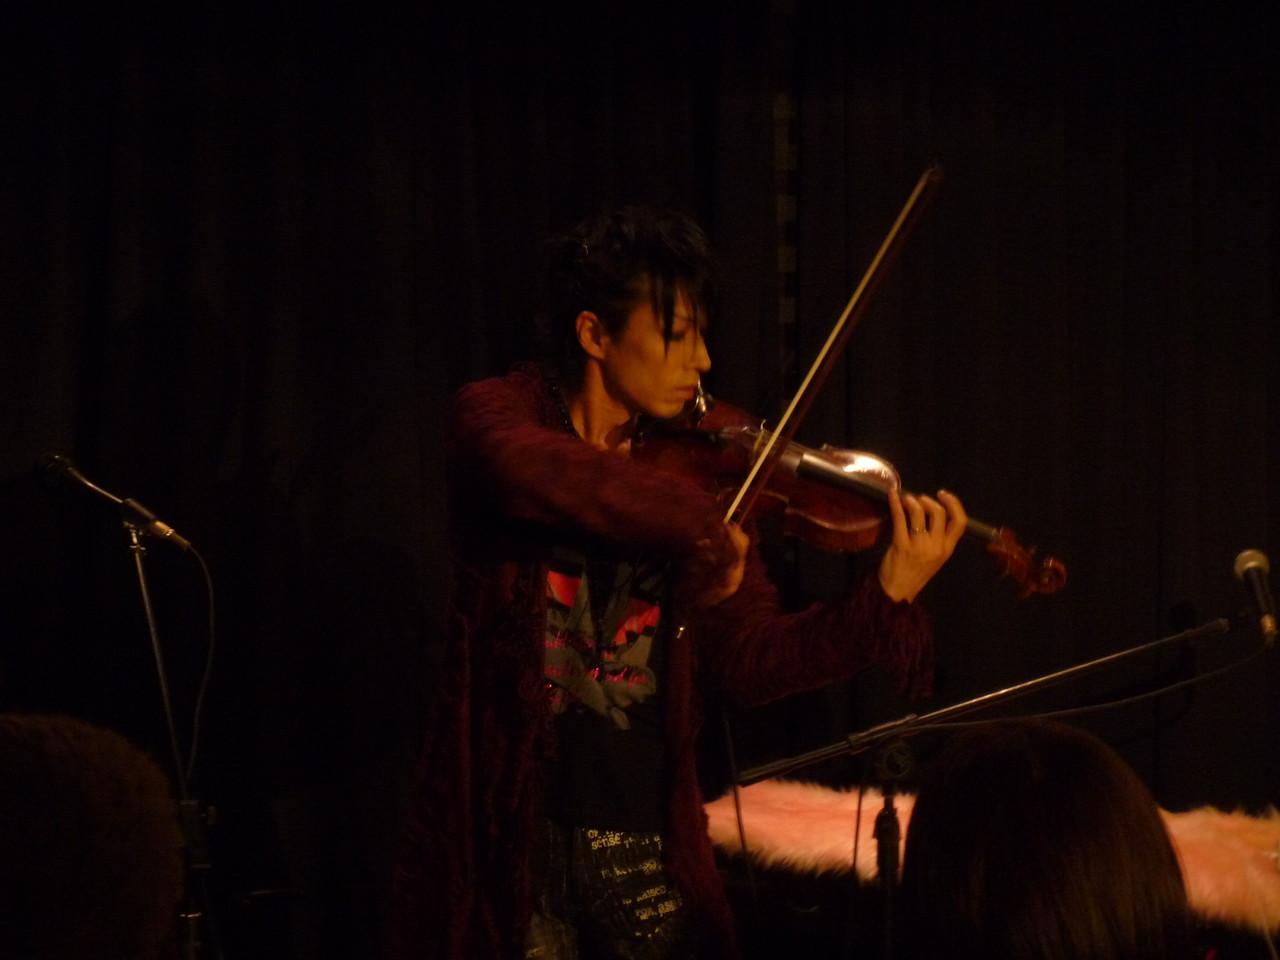 Take ソロ Live ♪ X JAPANの曲をX魂込めて演奏しました♪